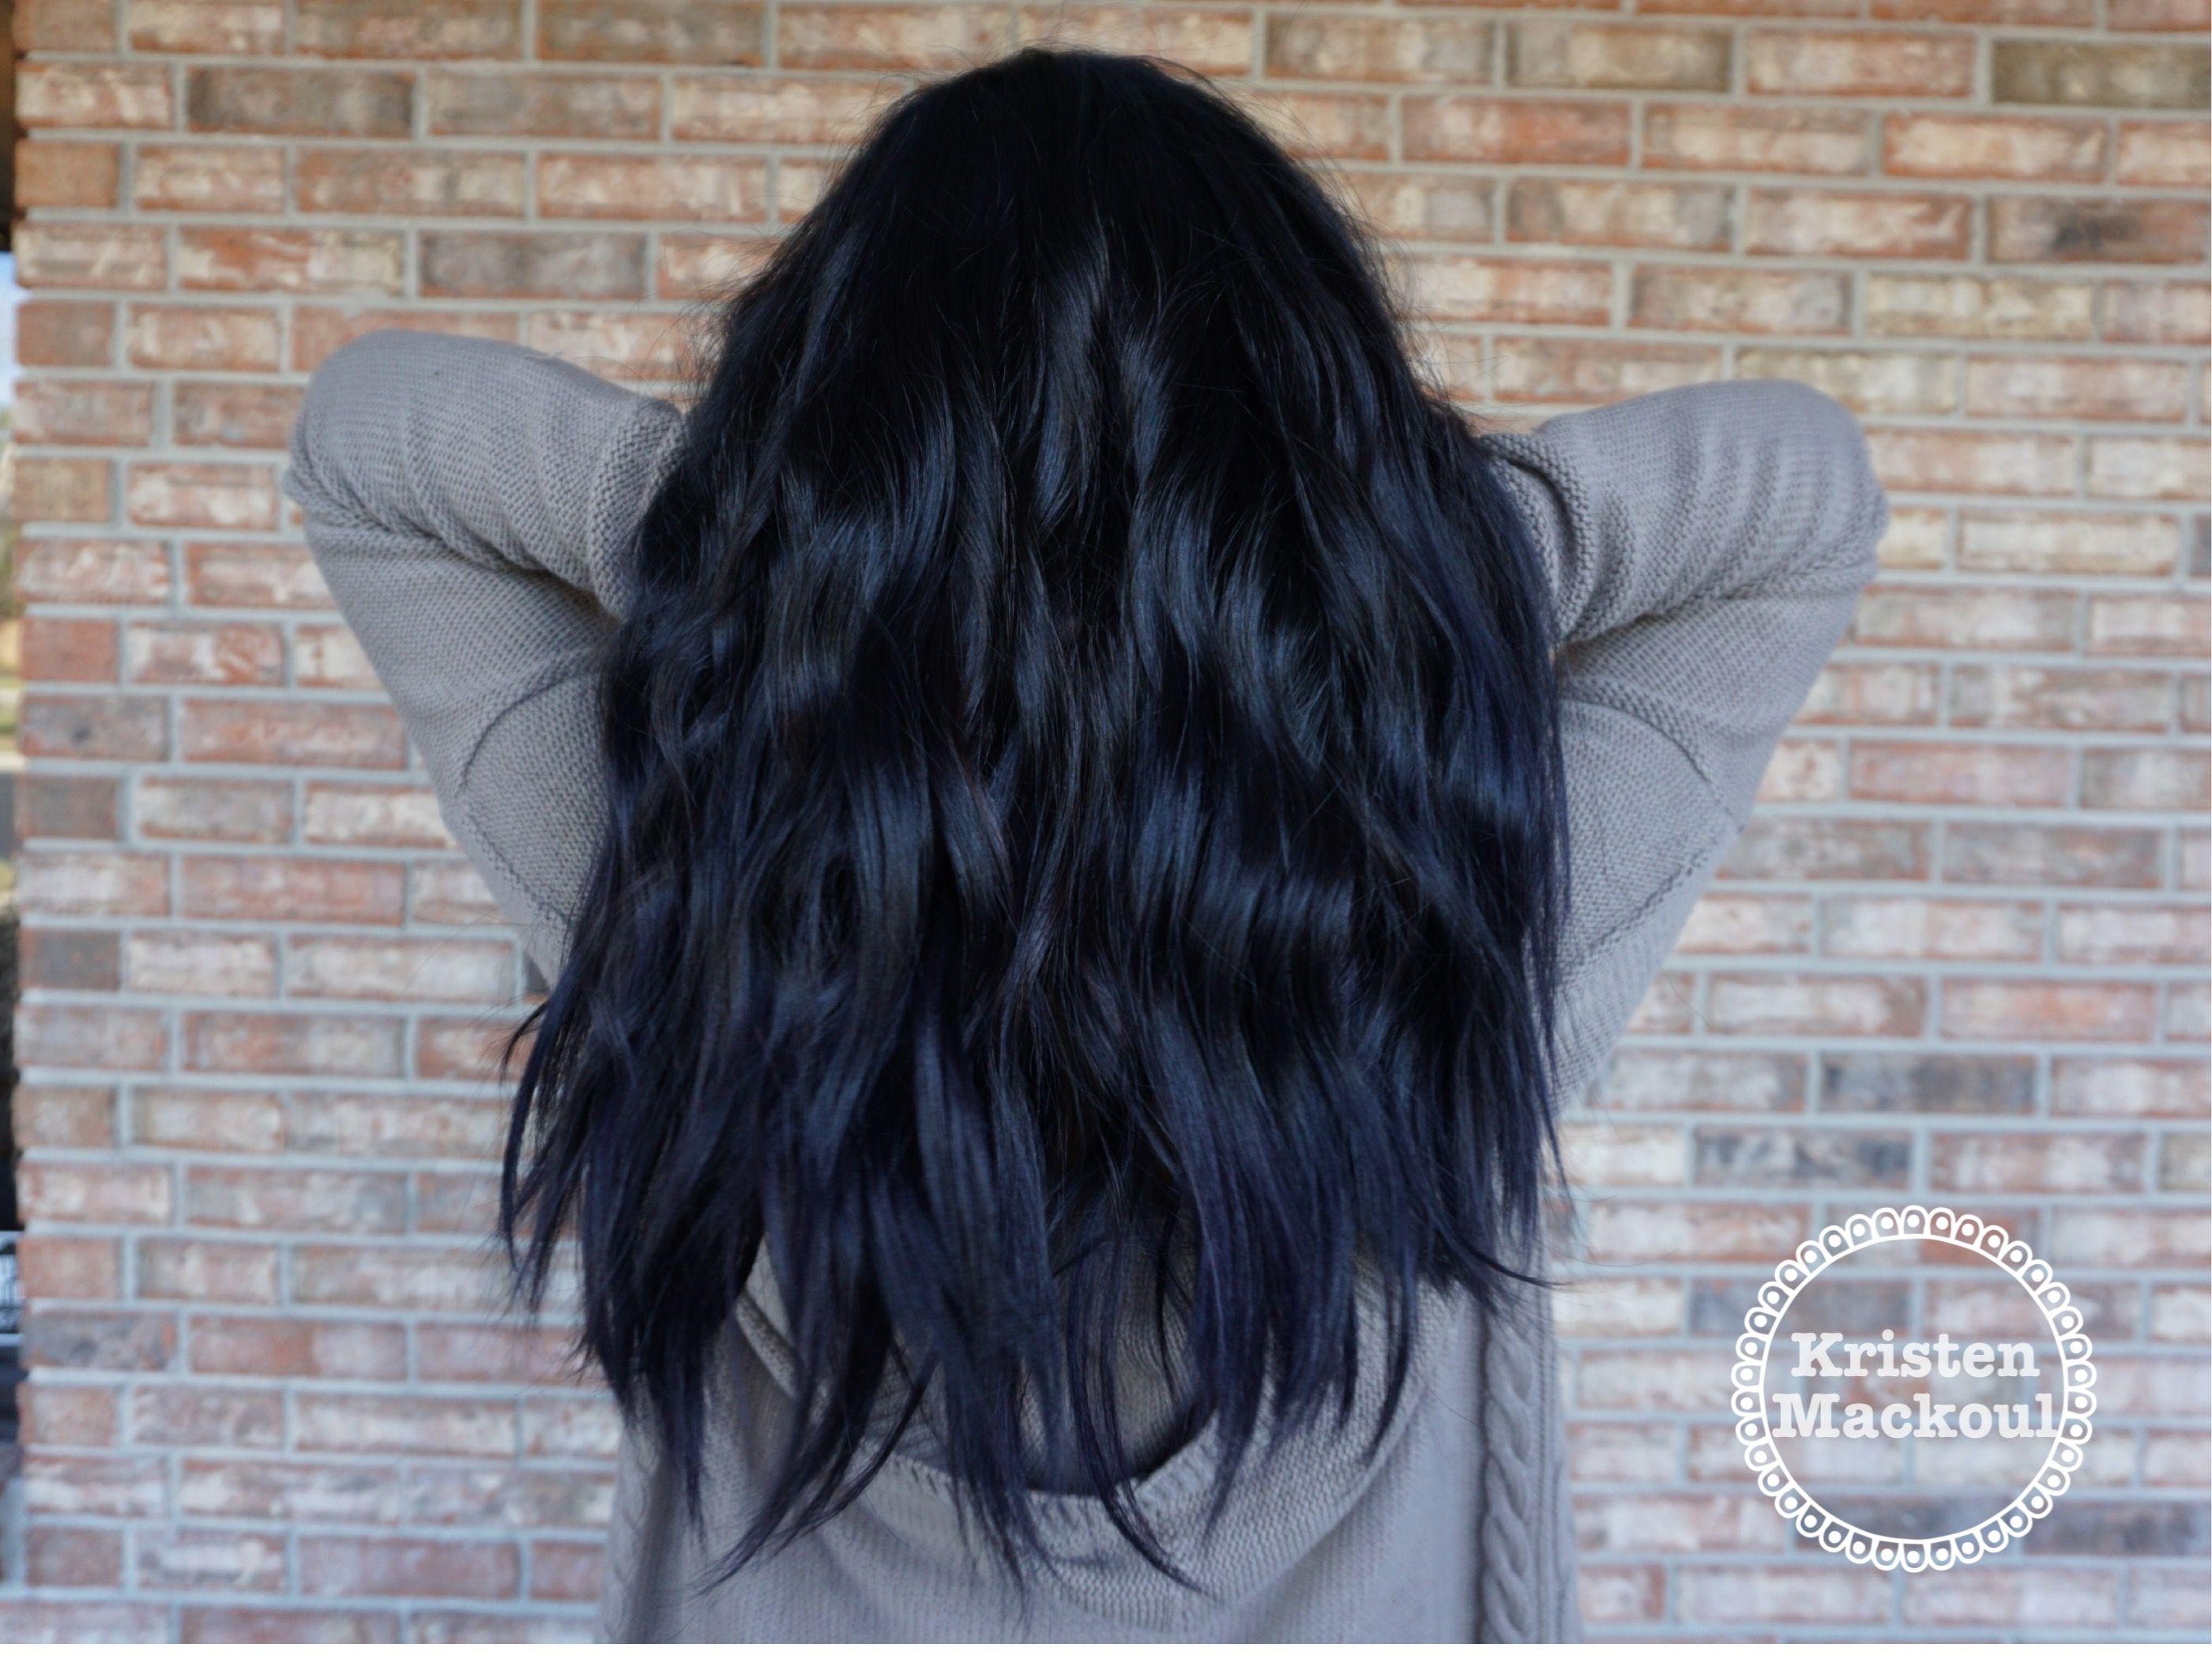 Black men hair line images colors as well hair studio design ideas - Navy Blue Hair Blue Tint Hair Ig Kristenmackoul